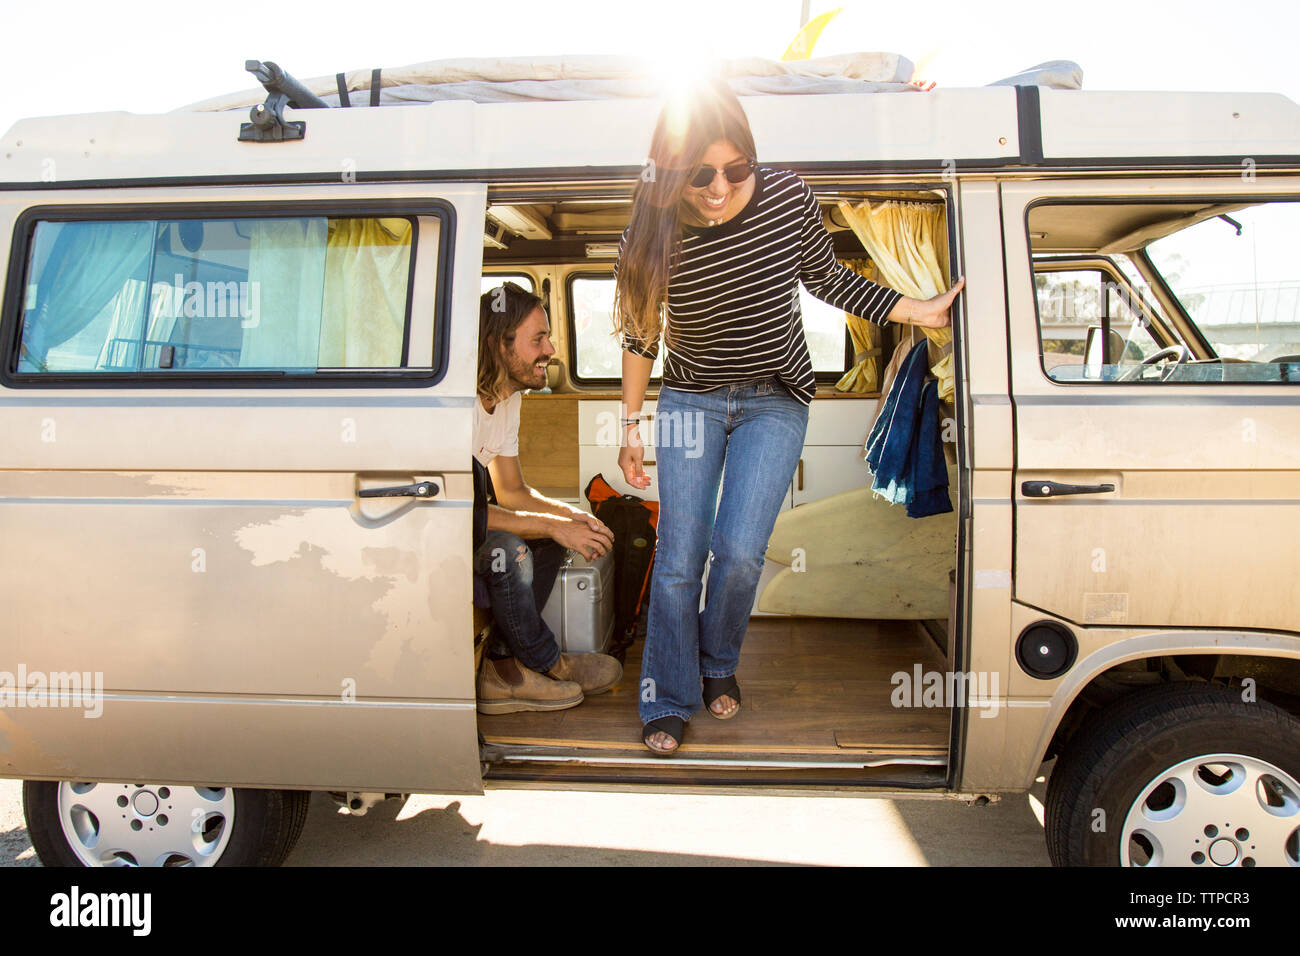 Happy woman disembarking mini van during vacation with man Stock Photo